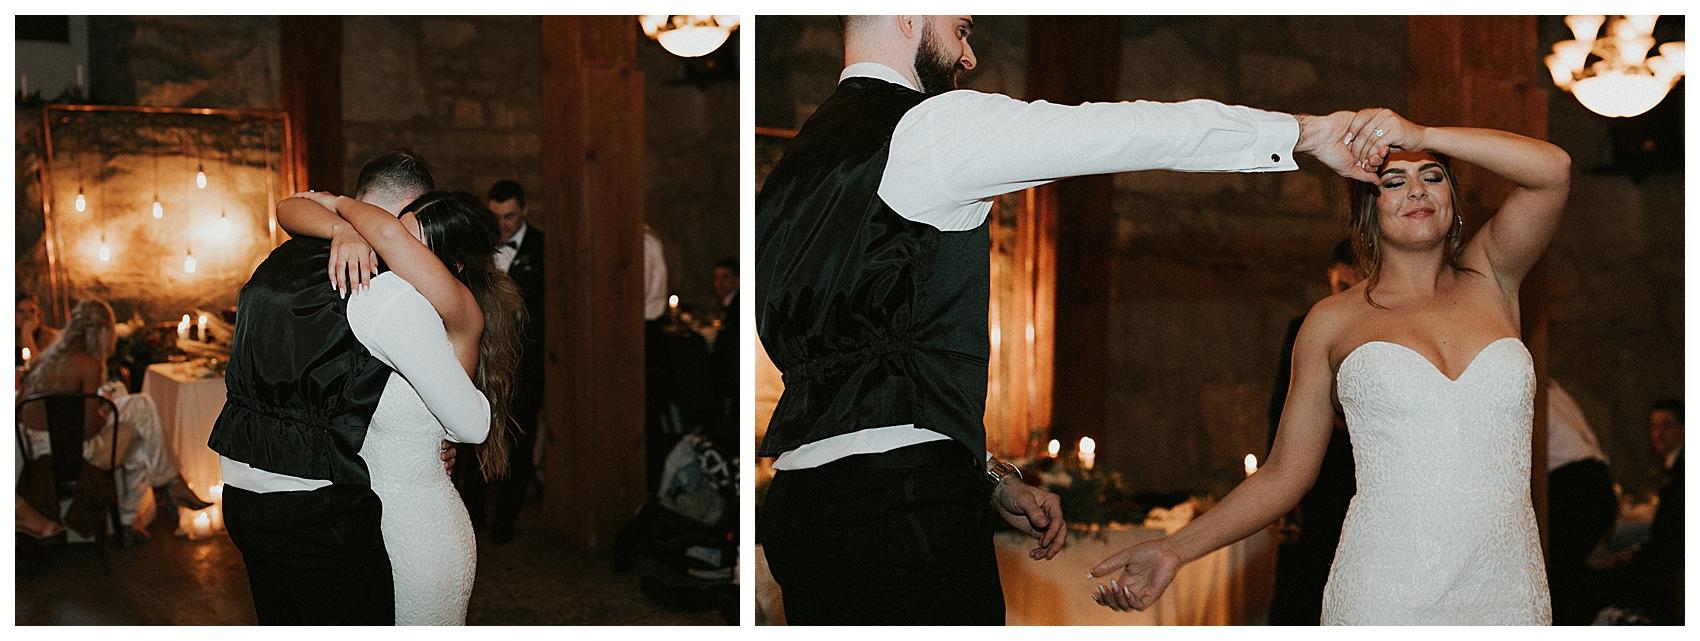 Chateau Rive Spokane Wedding Cassie Trottier Photography01114.jpg